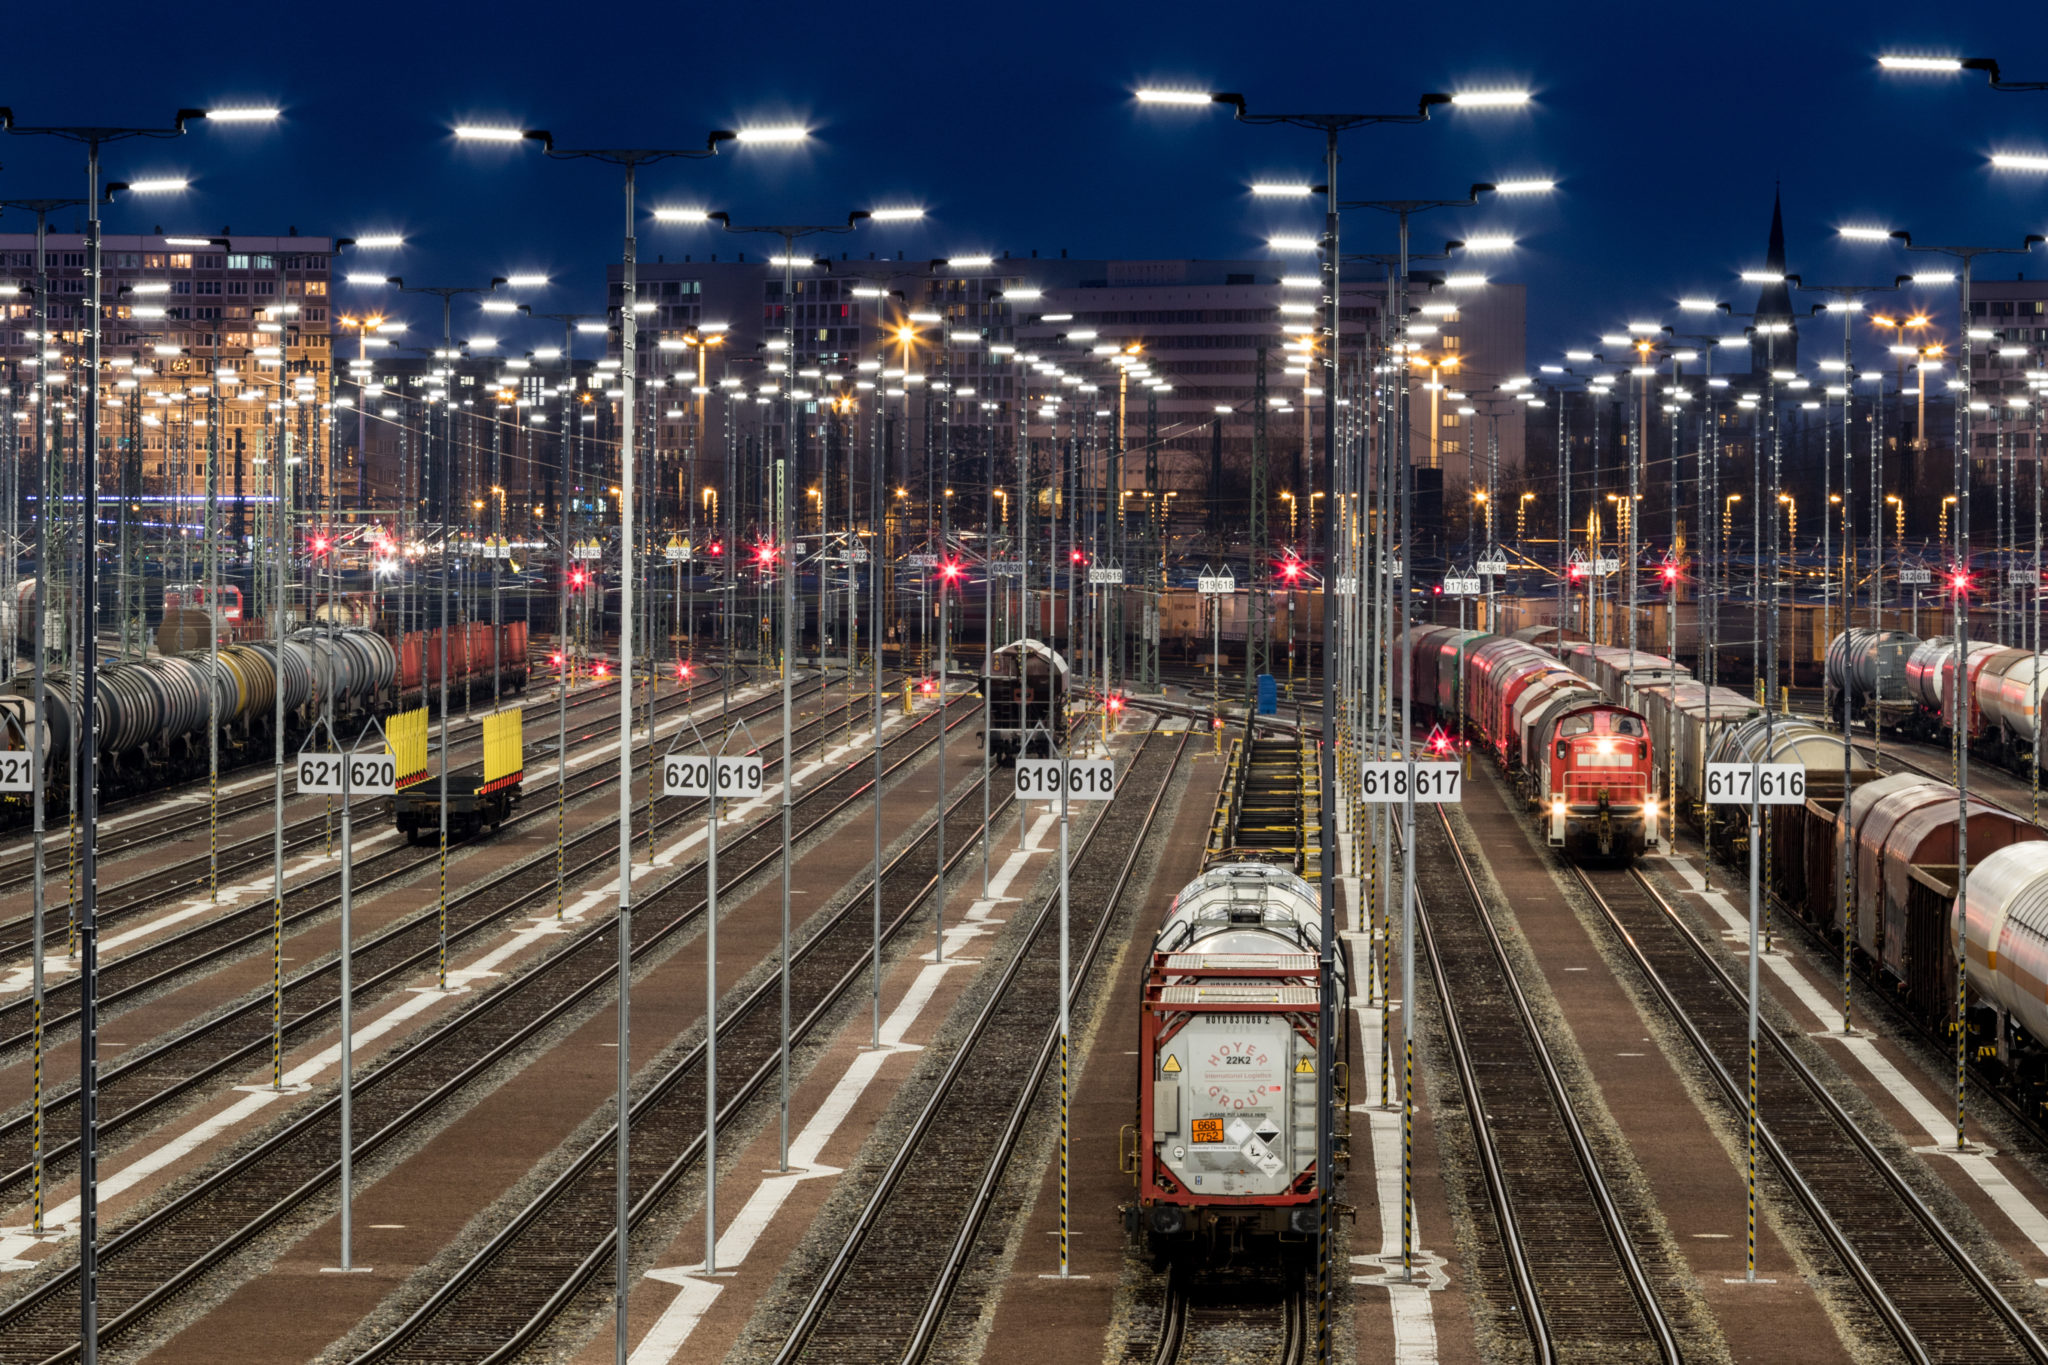 DB Train Formation Yard in Halle (Saale)